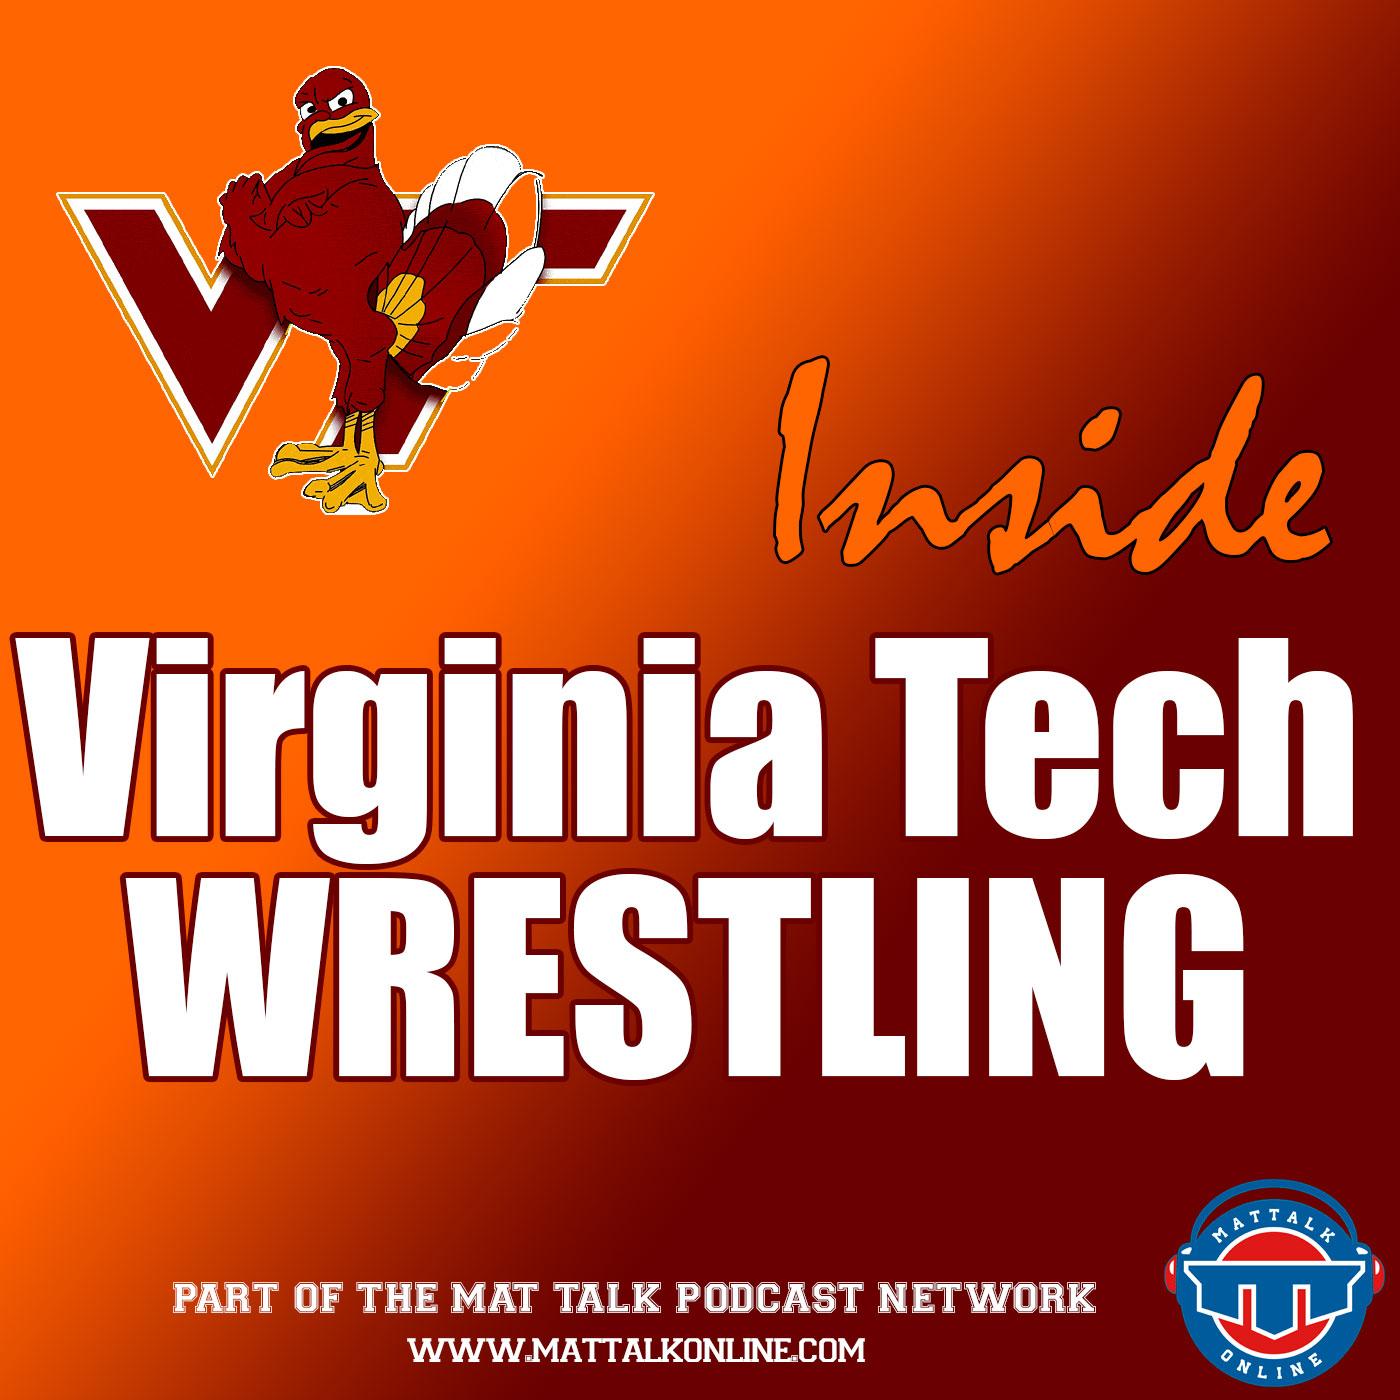 Episode 12 of Inside Virginia Tech Wrestling is live - Virginia Tech